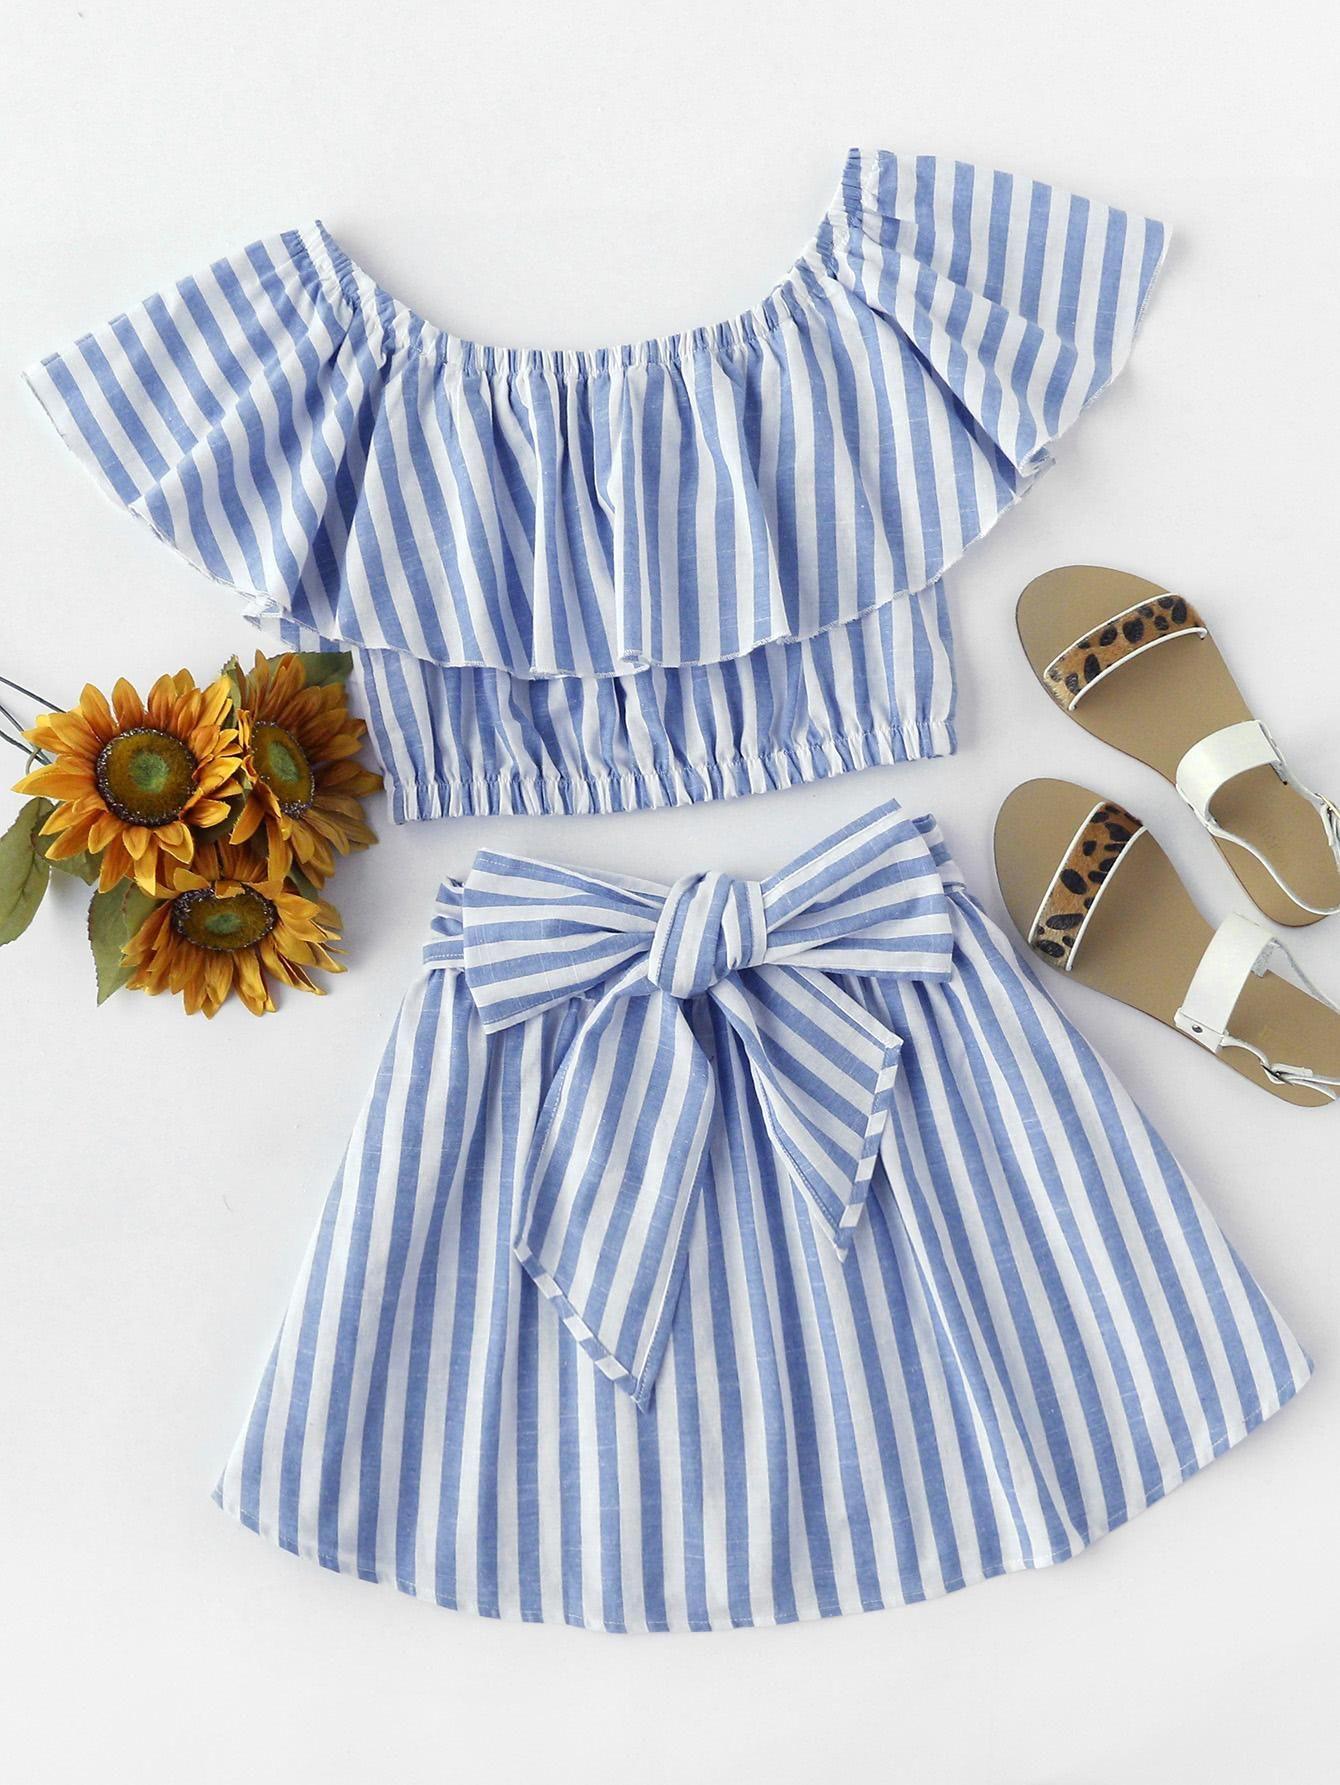 280ae04e0a22 SheIn - SheIn Flounce Bardot Top And Bow Front Skirt Set - AdoreWe ...